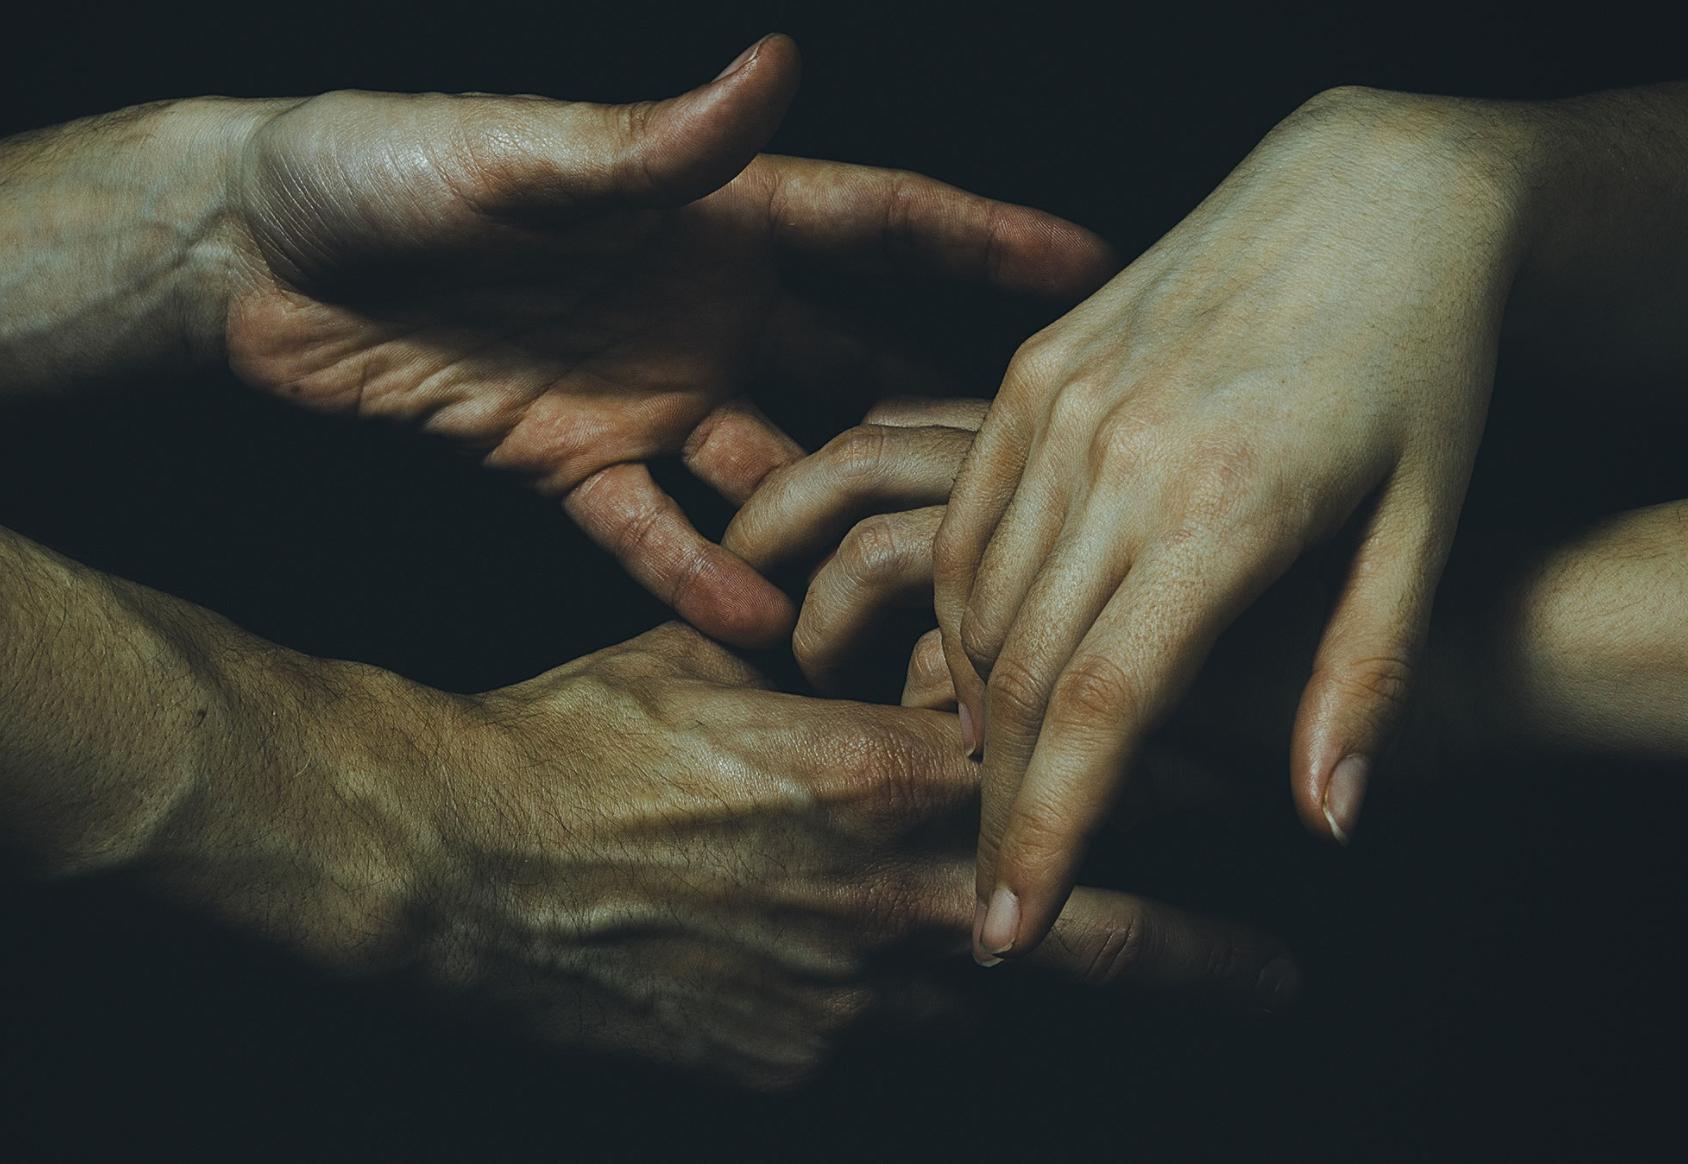 The Baroque Dreamers : Photography by Aitor Frías & Cecilia Jiménez.